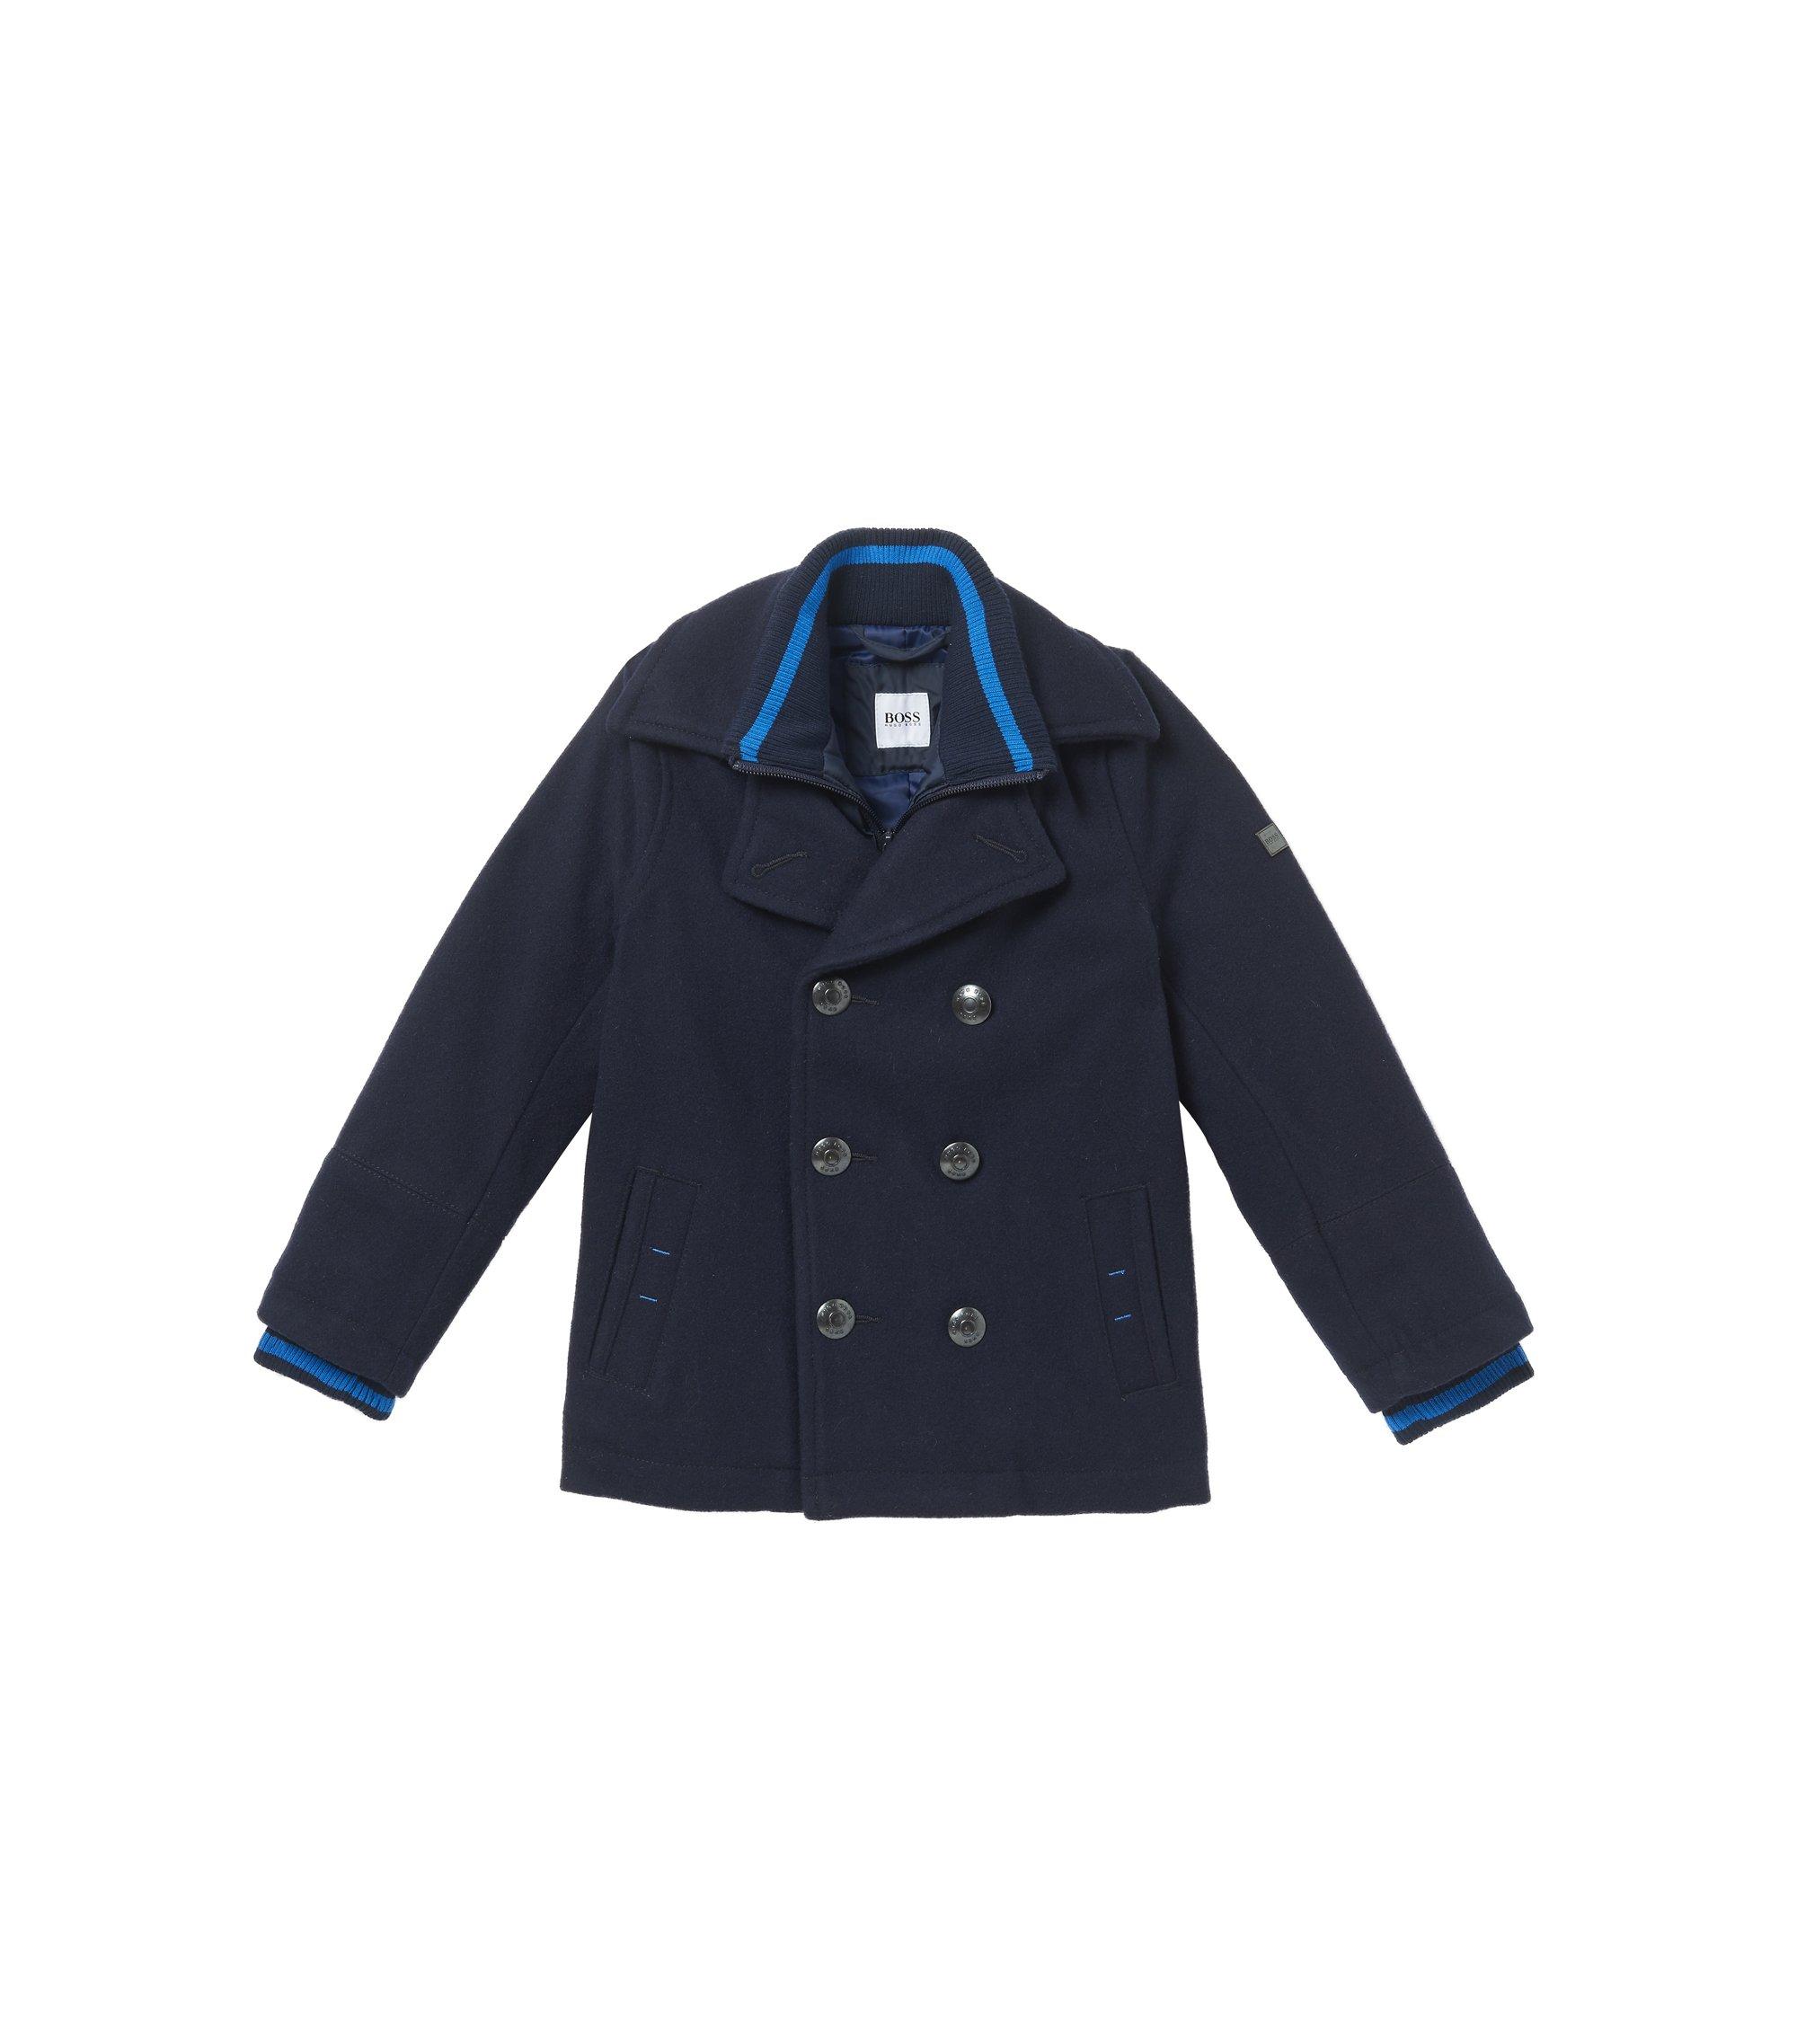 'J26287' | Boys Layered Pea Coat, Dark Blue